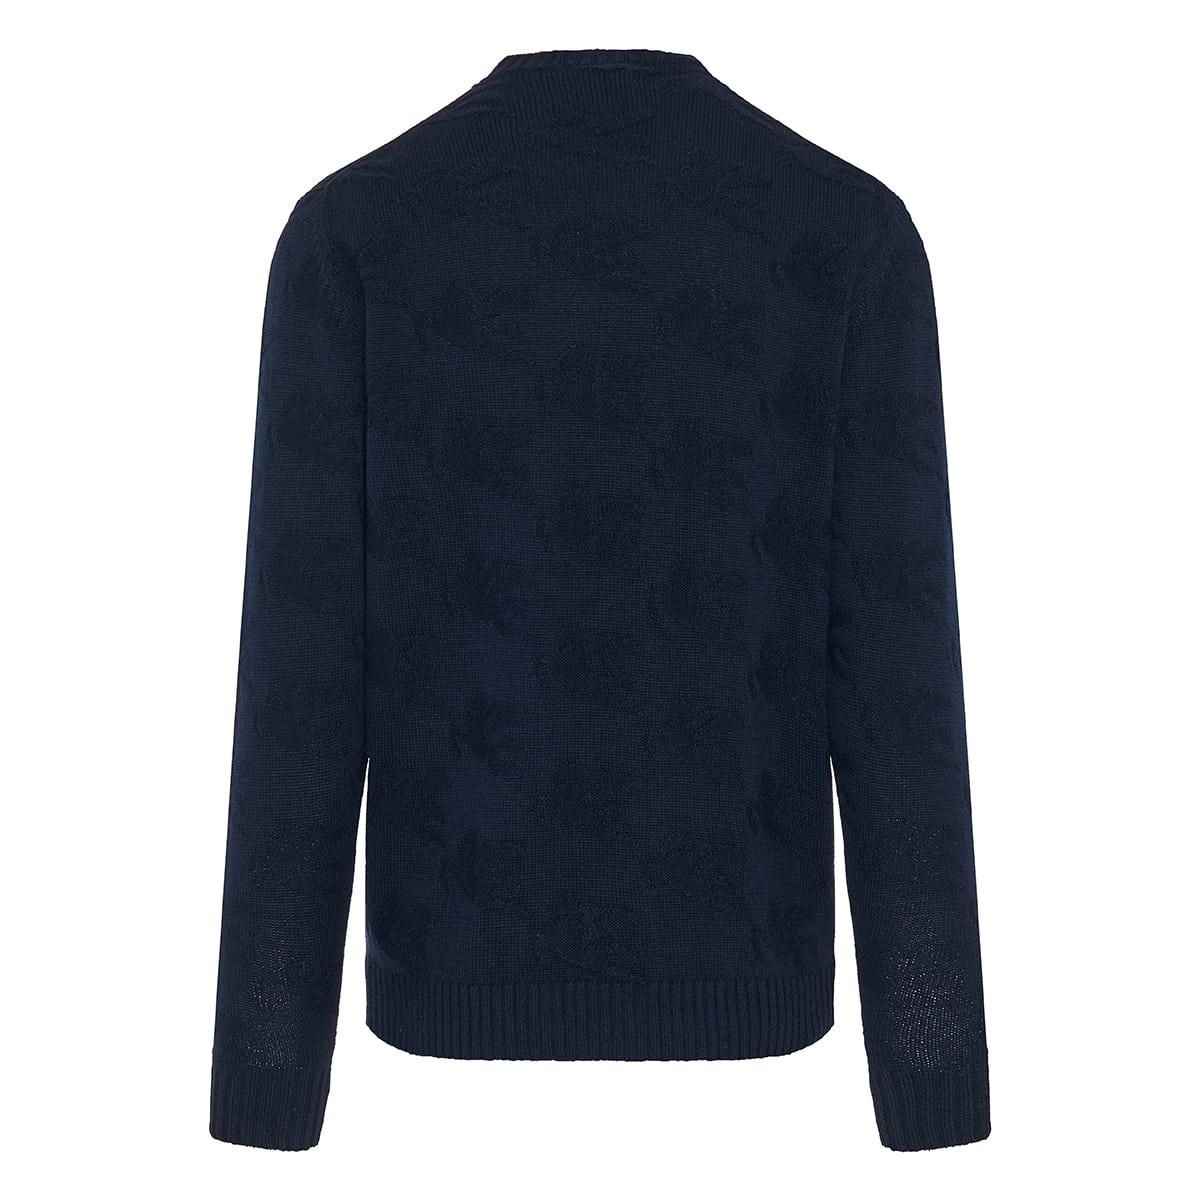 Pegaso jacquard wool sweater